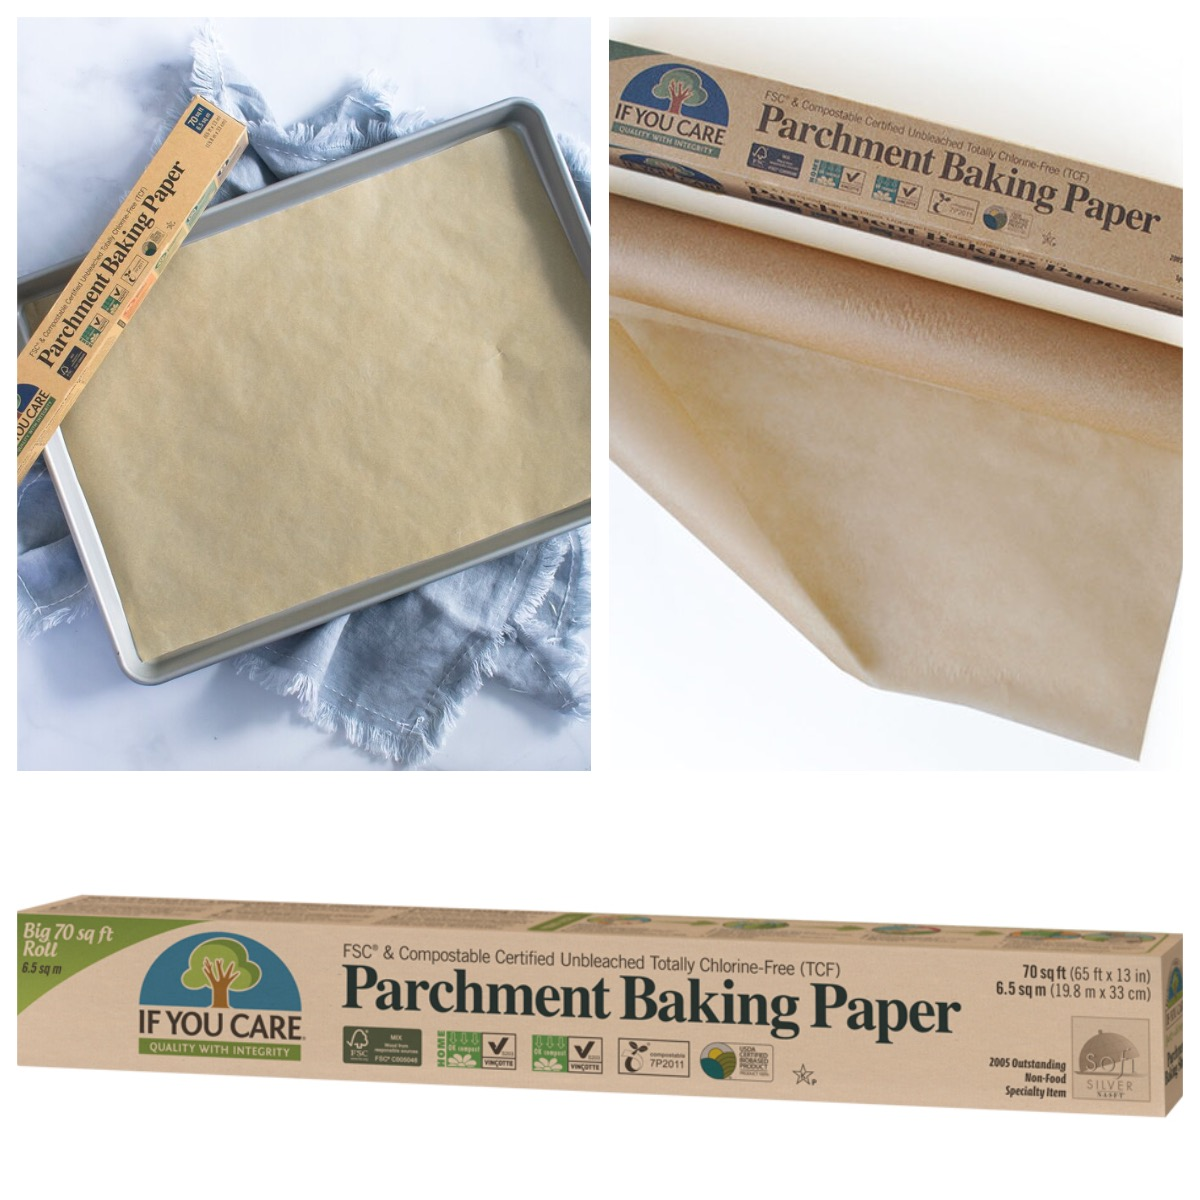 IF YOU CARE  PARCHMENT BAKING SHEETS 24 Pre-cut Sheets